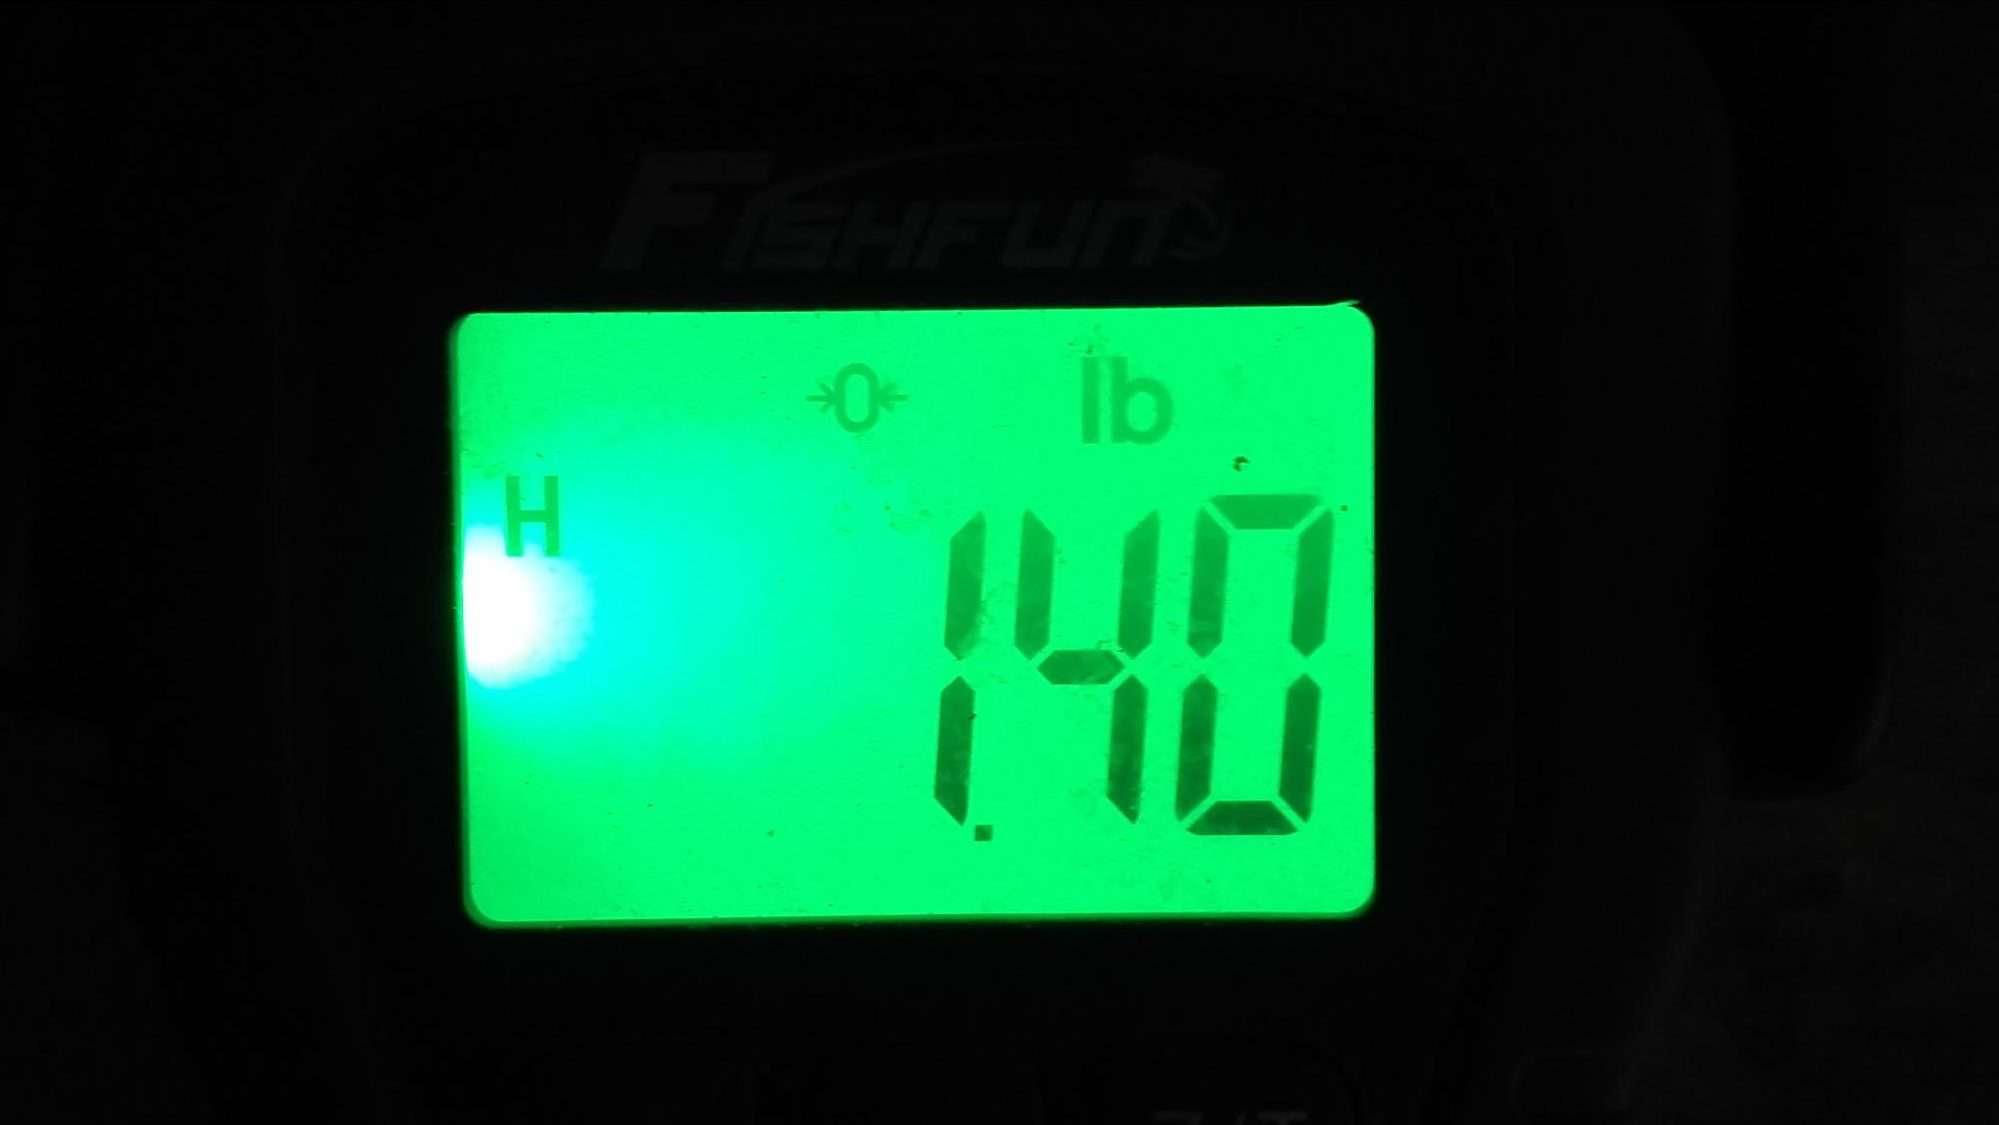 Drag 1.4 lb